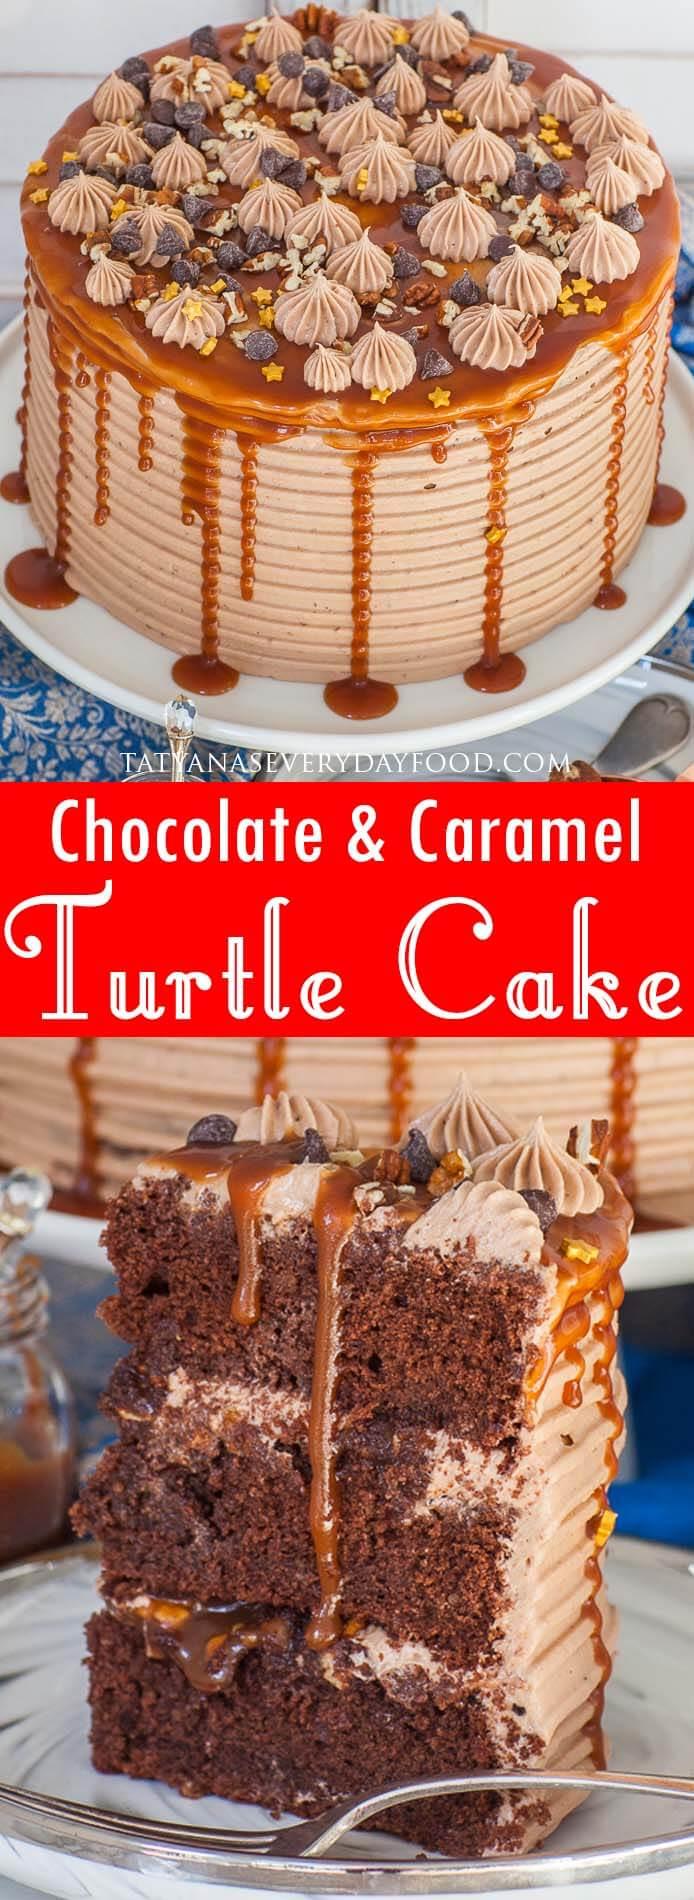 Caramel Chocolate Turtle Cake video recipe